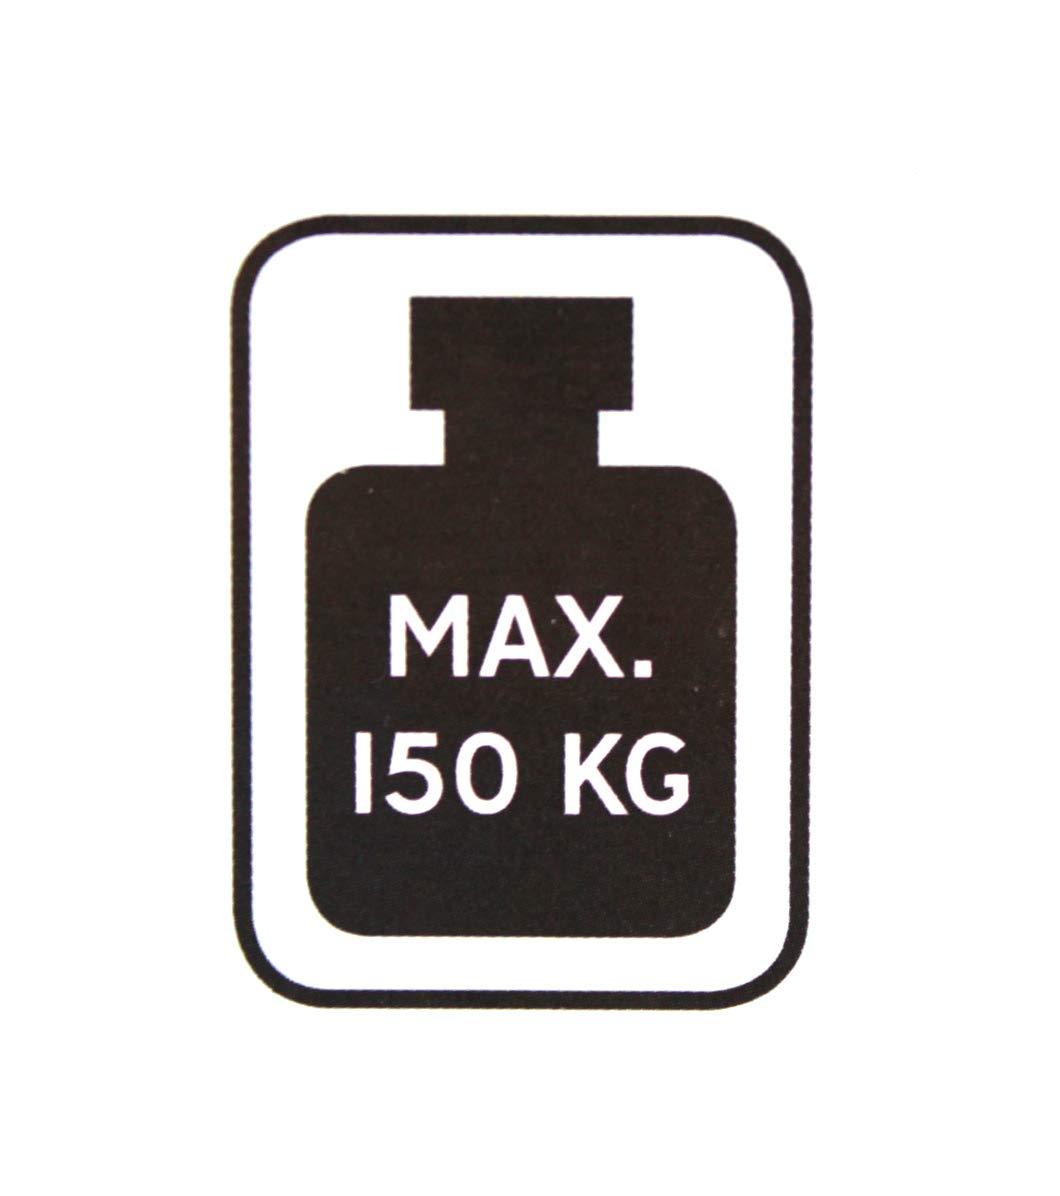 150 kg STEIGHILFE Duschhocker Badewannensitz Badtritt Fu/ßhocker T/ÜV cf578